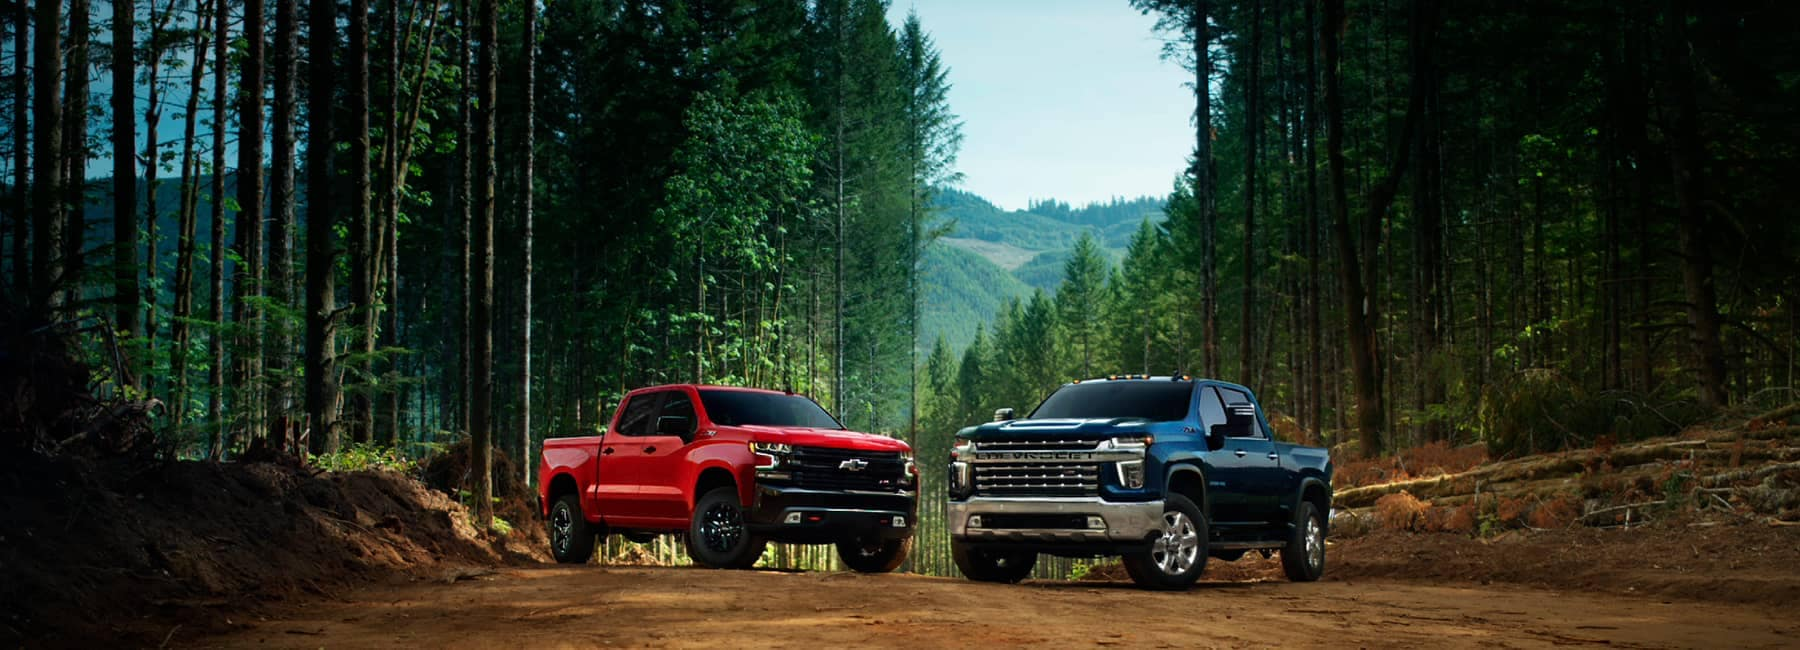 Two chevy trucks